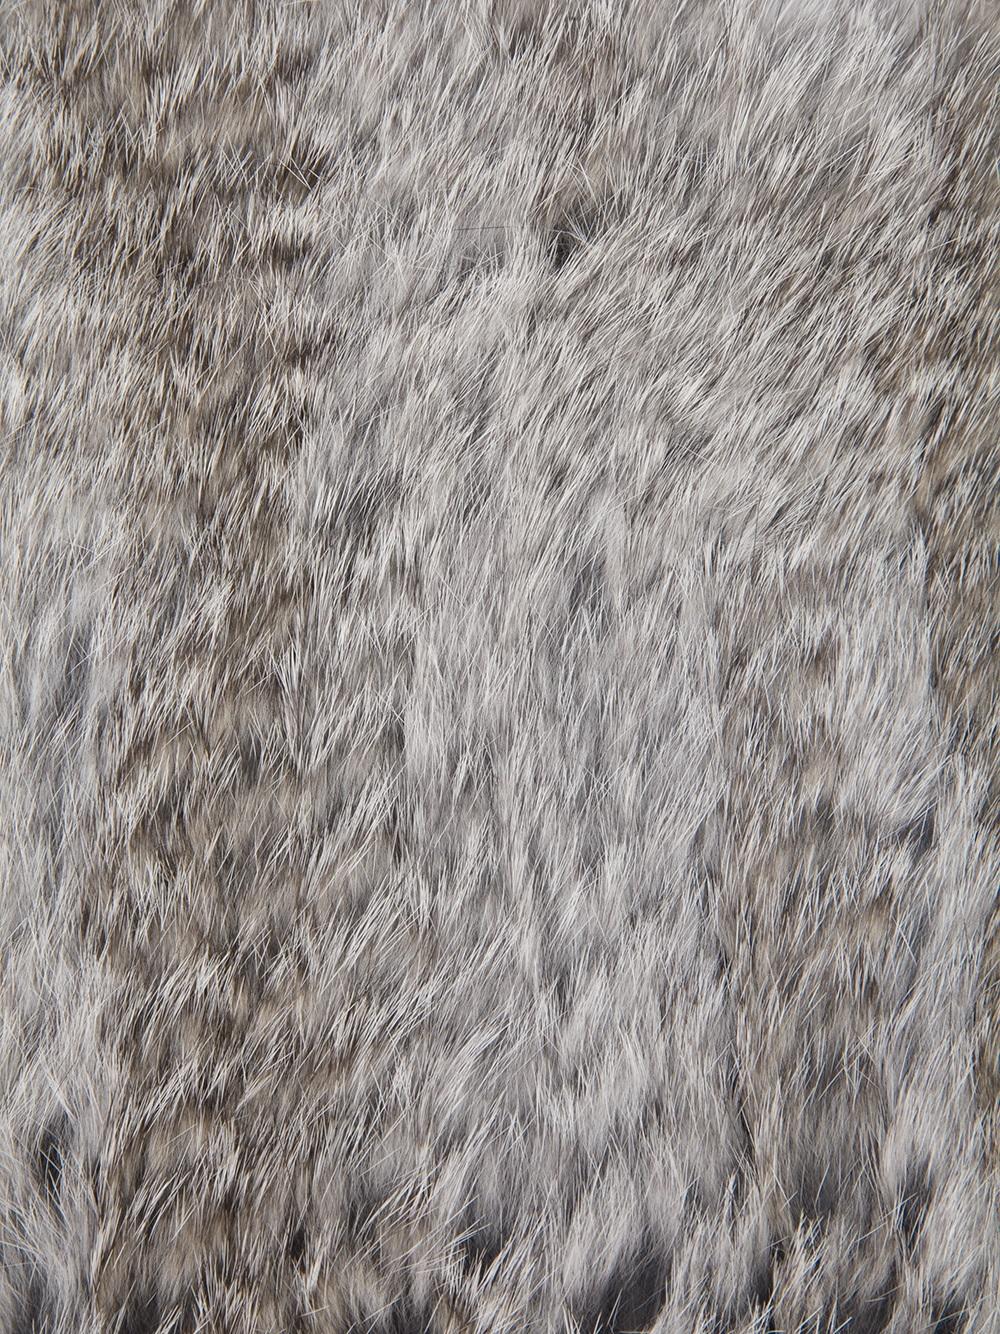 Emporio armani Rabbit Fur Snood in Gray Lyst